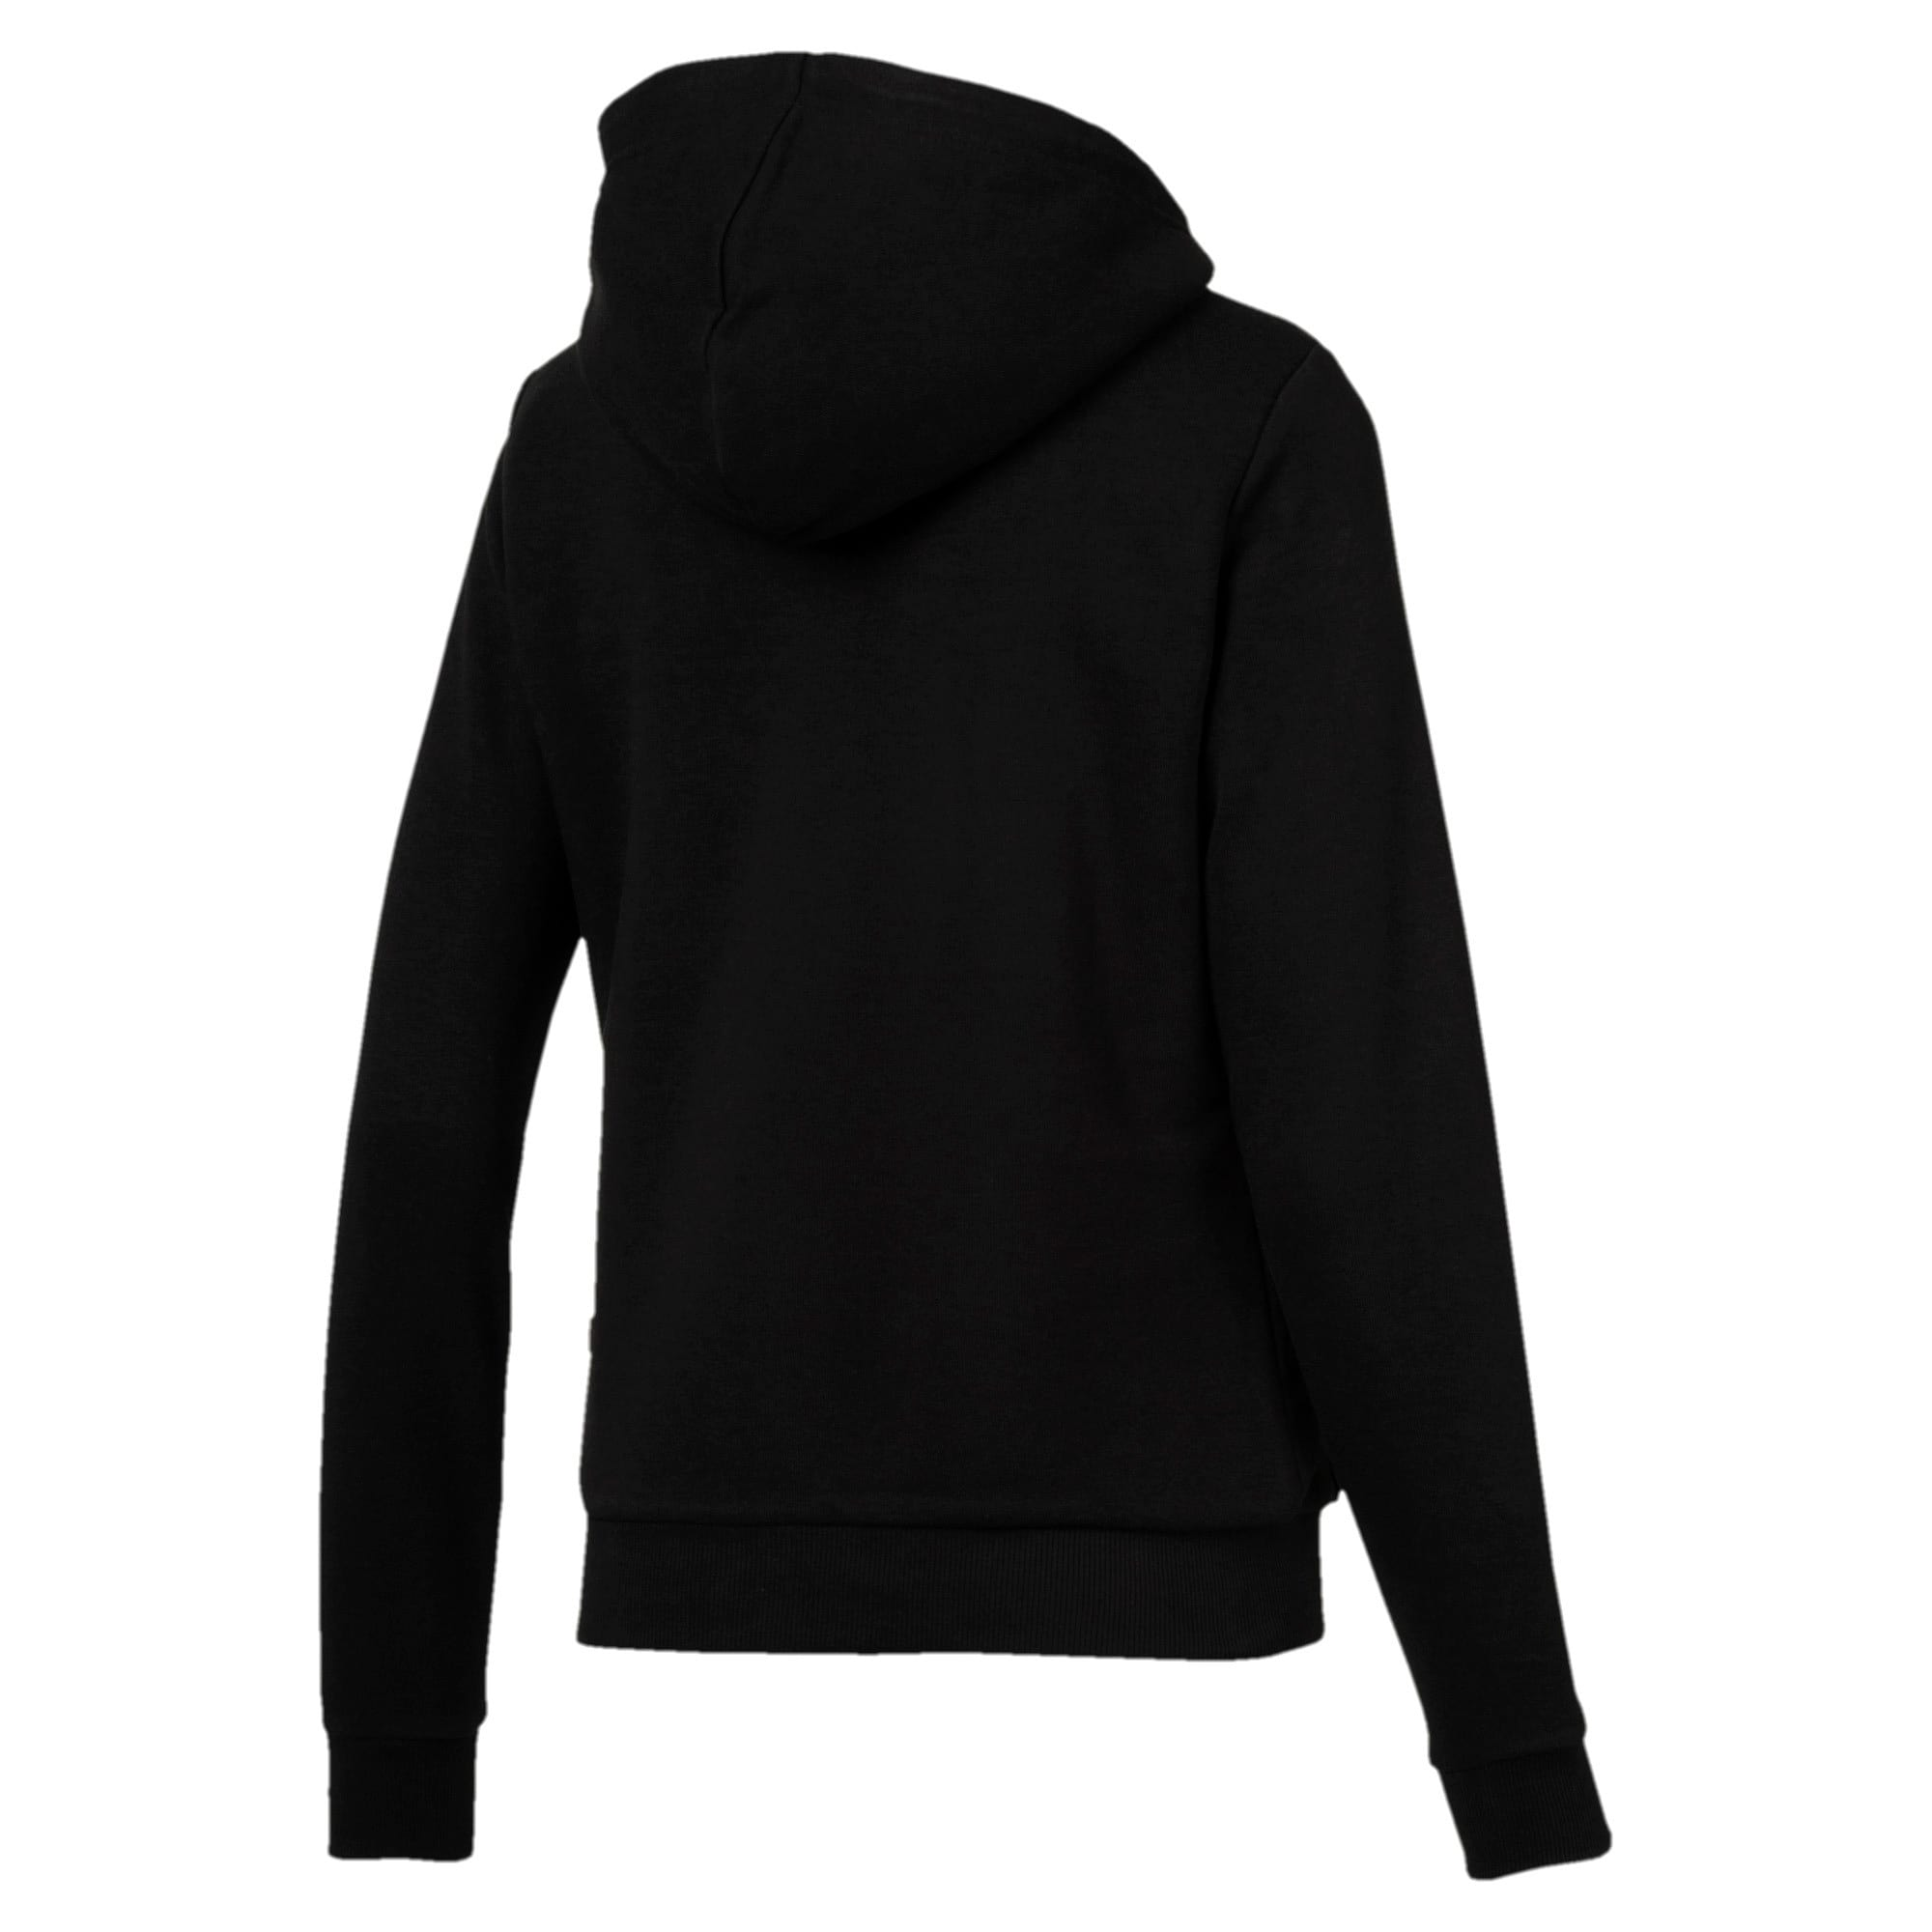 Miniatura 5 de Chaqueta con capucha Essentials + Sherpa para mujer, Cotton Black, mediano